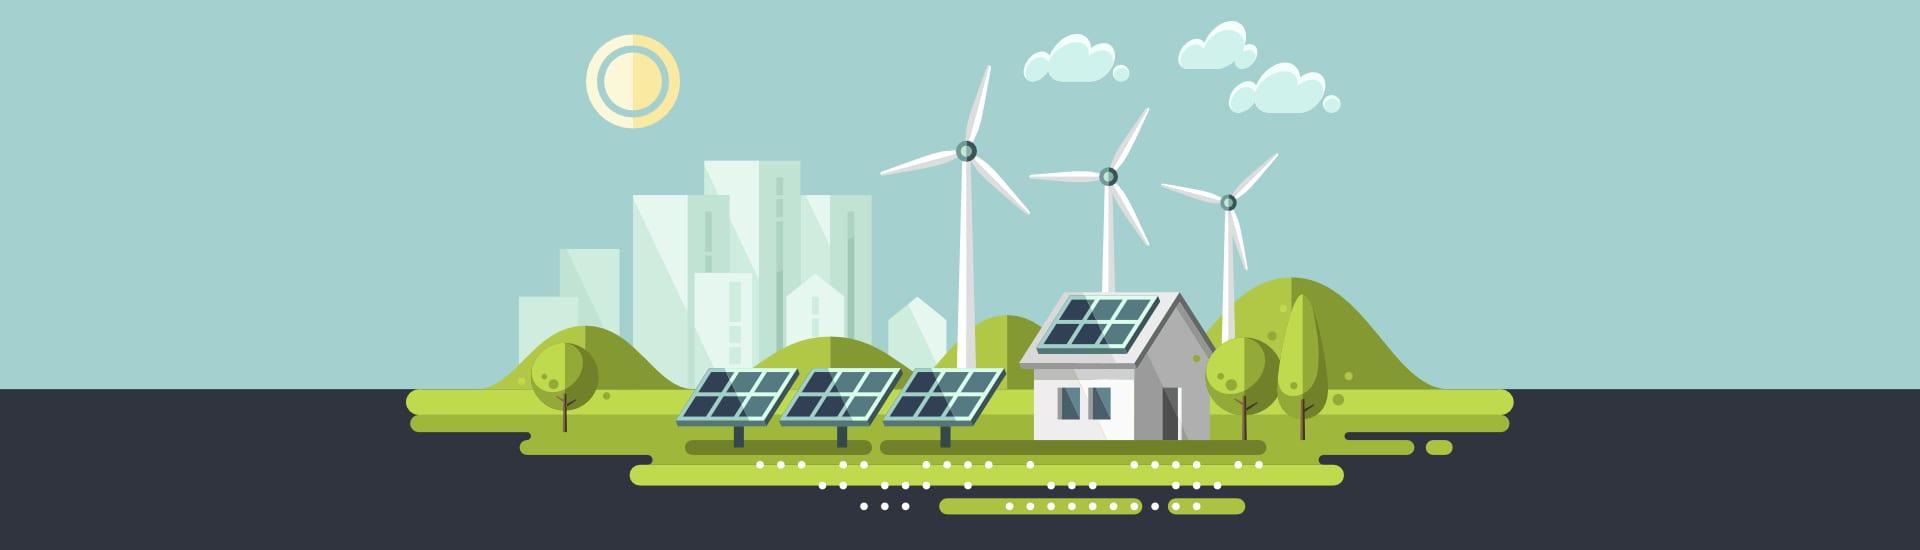 ekb-footer-green-energy-ps